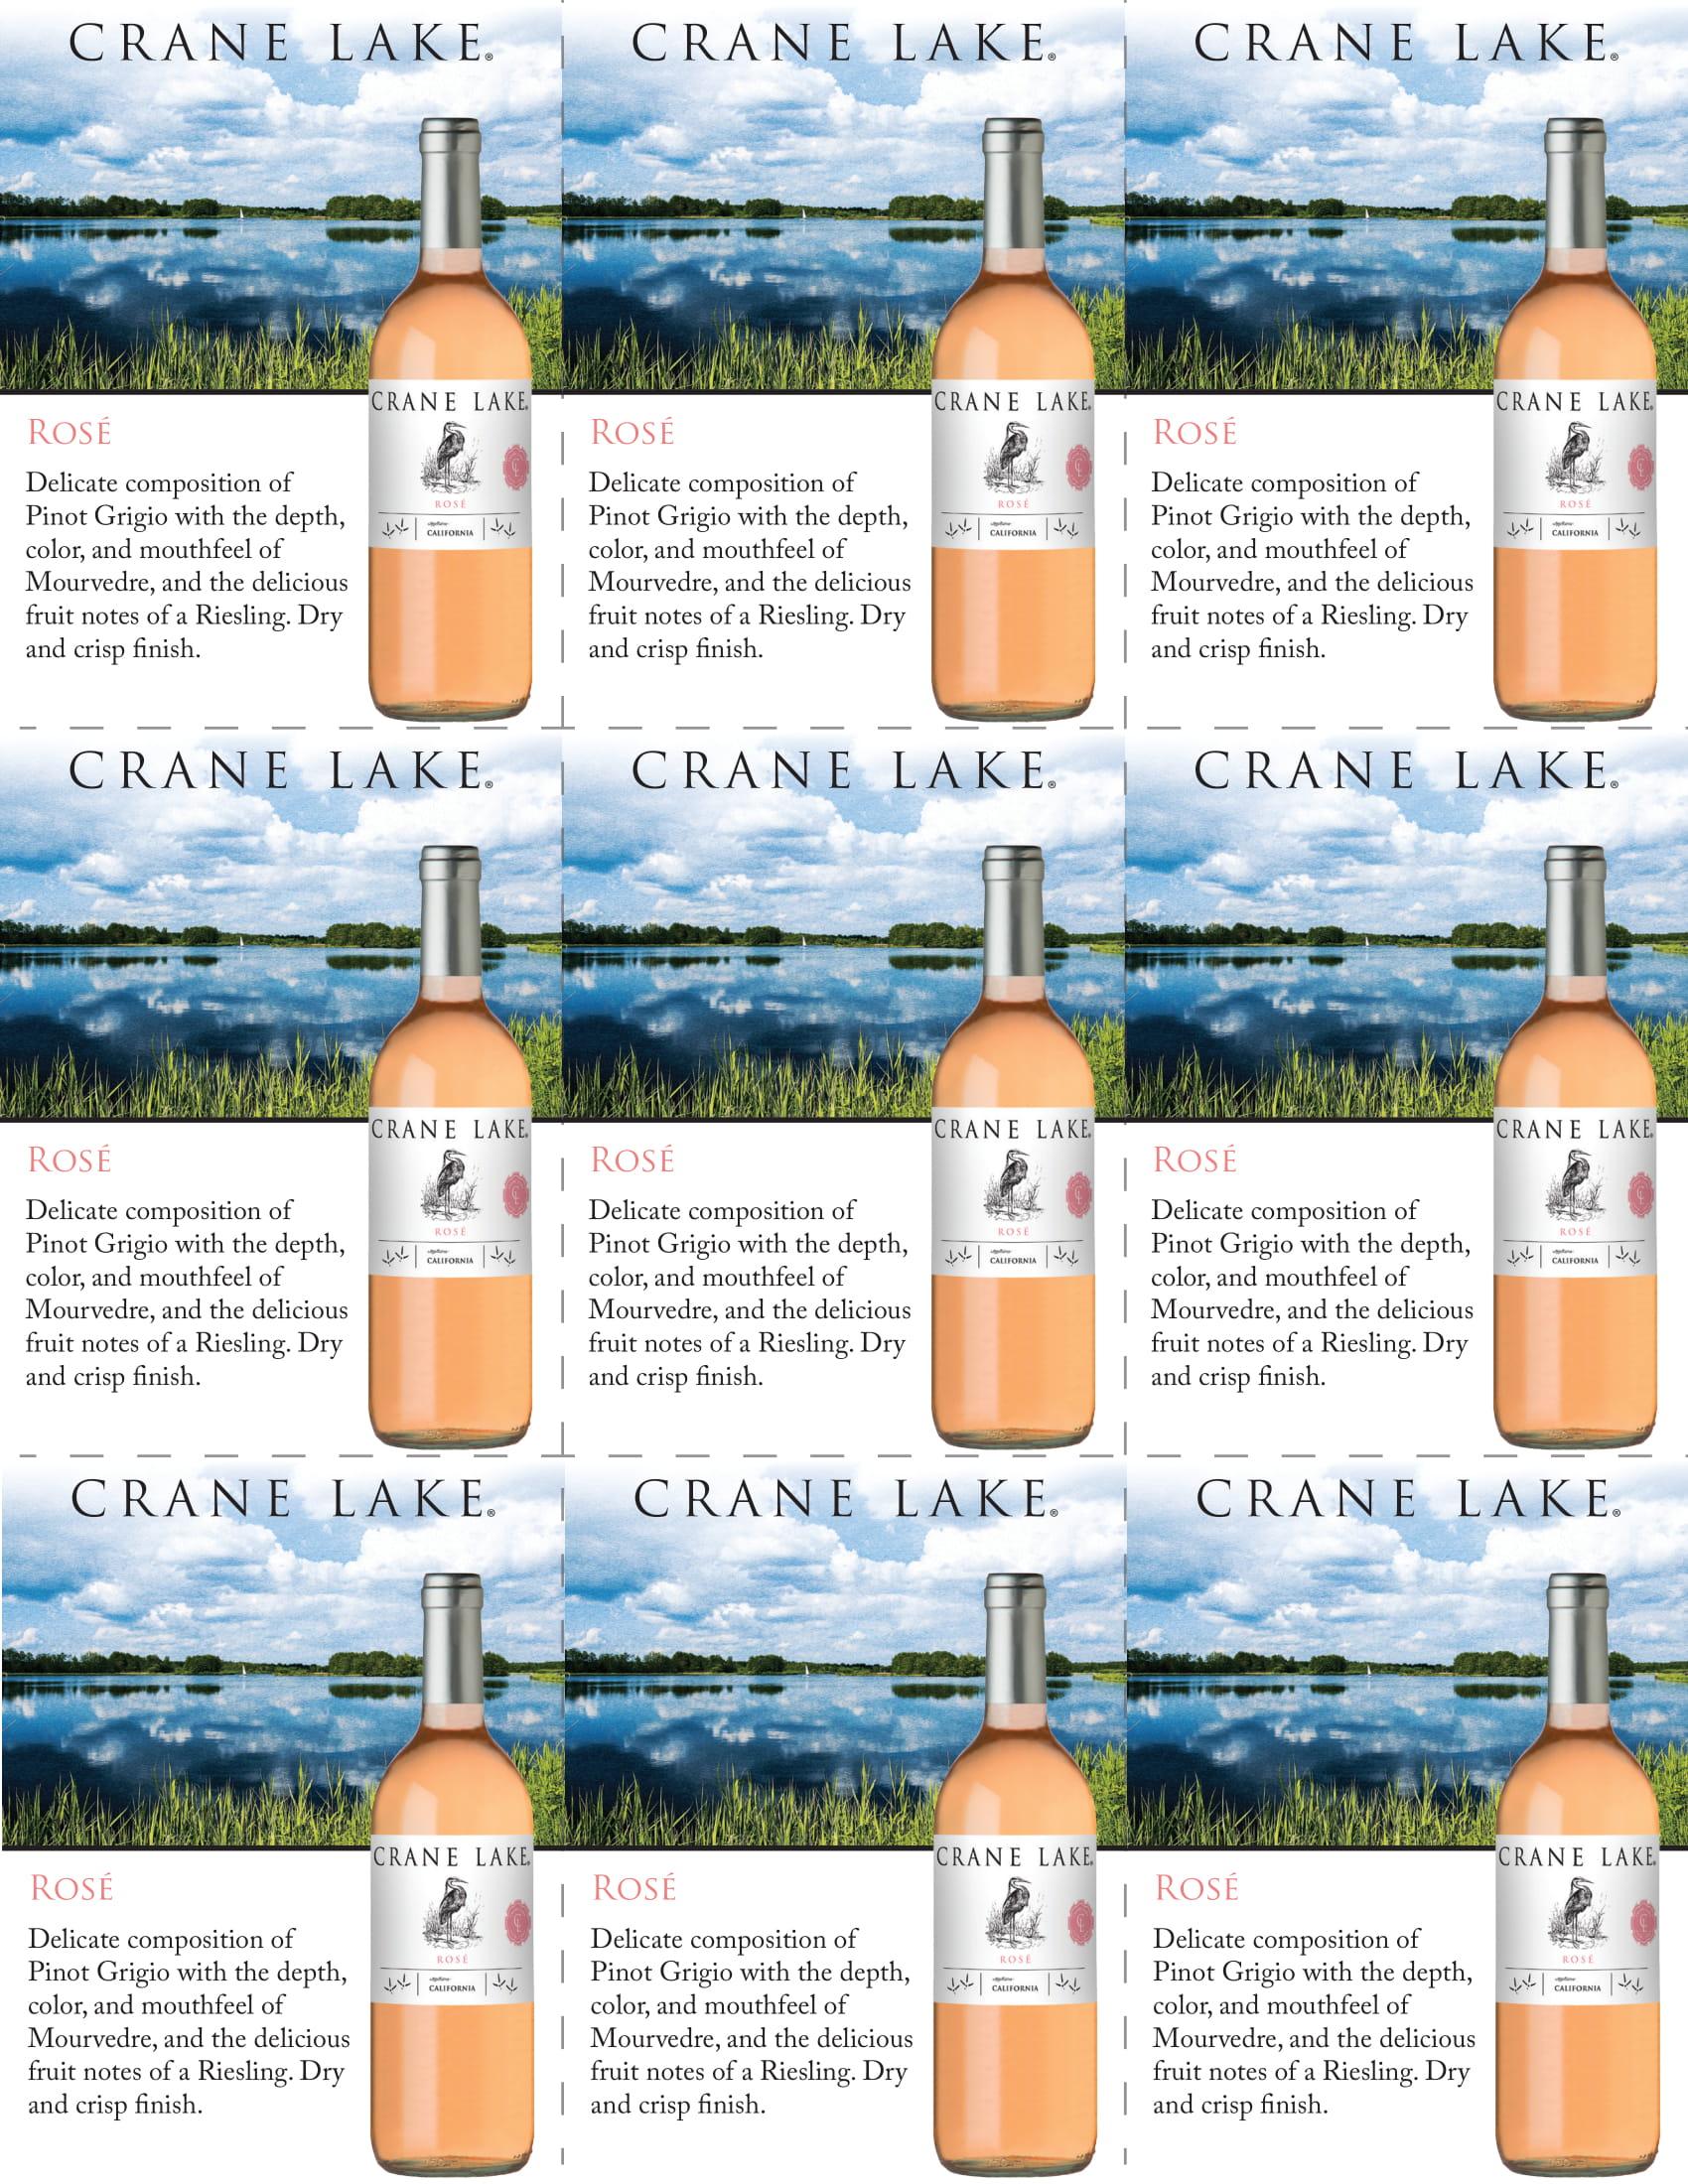 Crane Lake Rosé Shelf Talkers